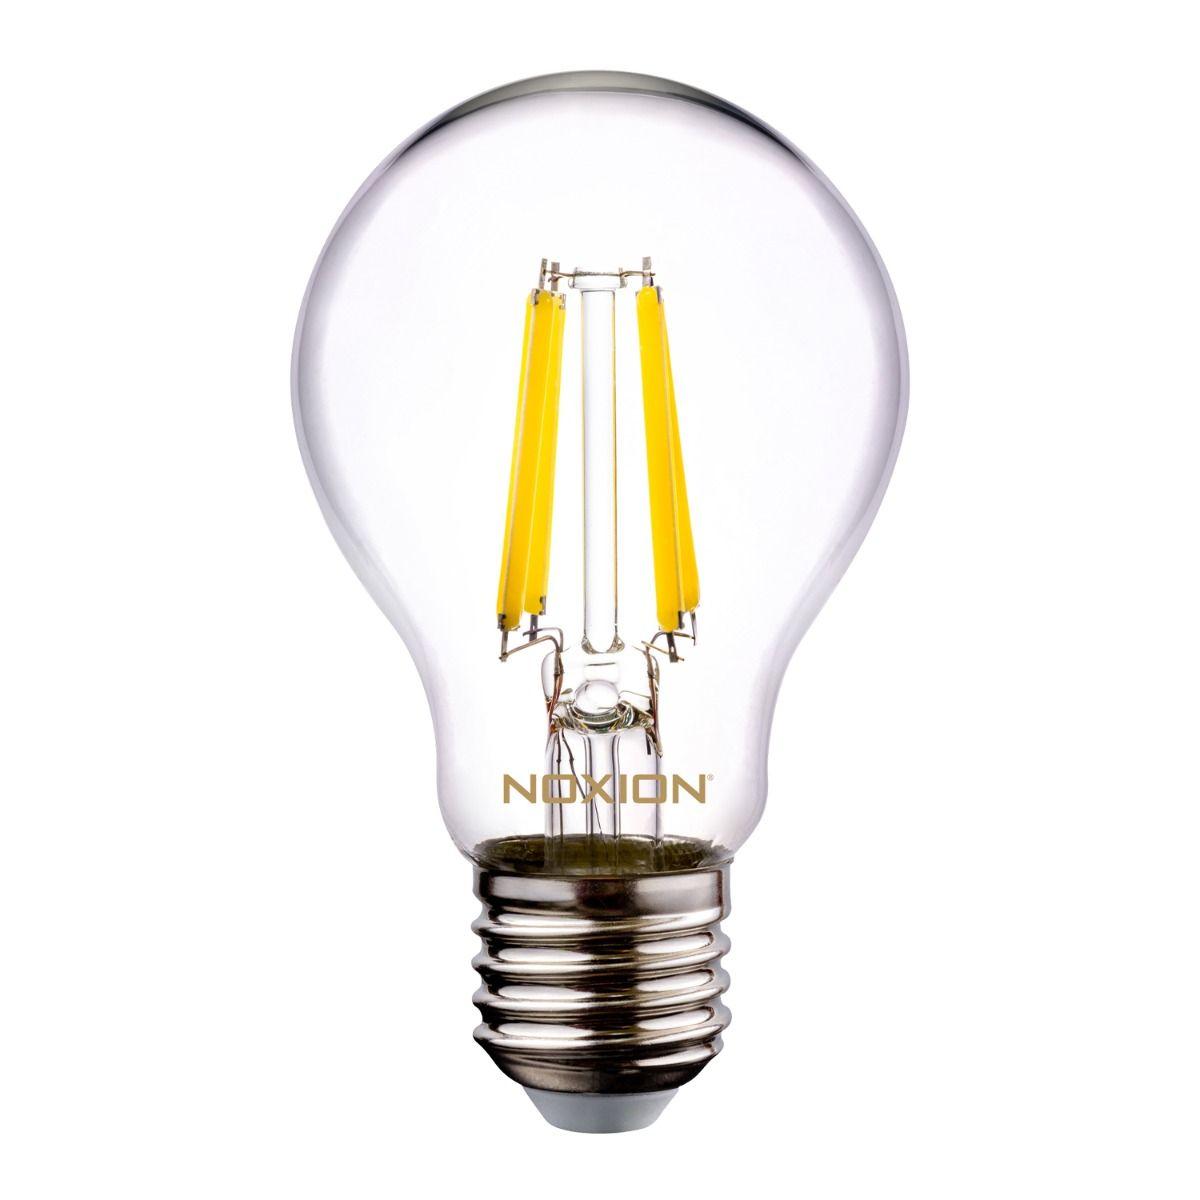 Noxion Lucent Filament LED Bulb A60 E27 220-240V 8.5W 1055LM CRI80 2700K DIM (75W eqv.)